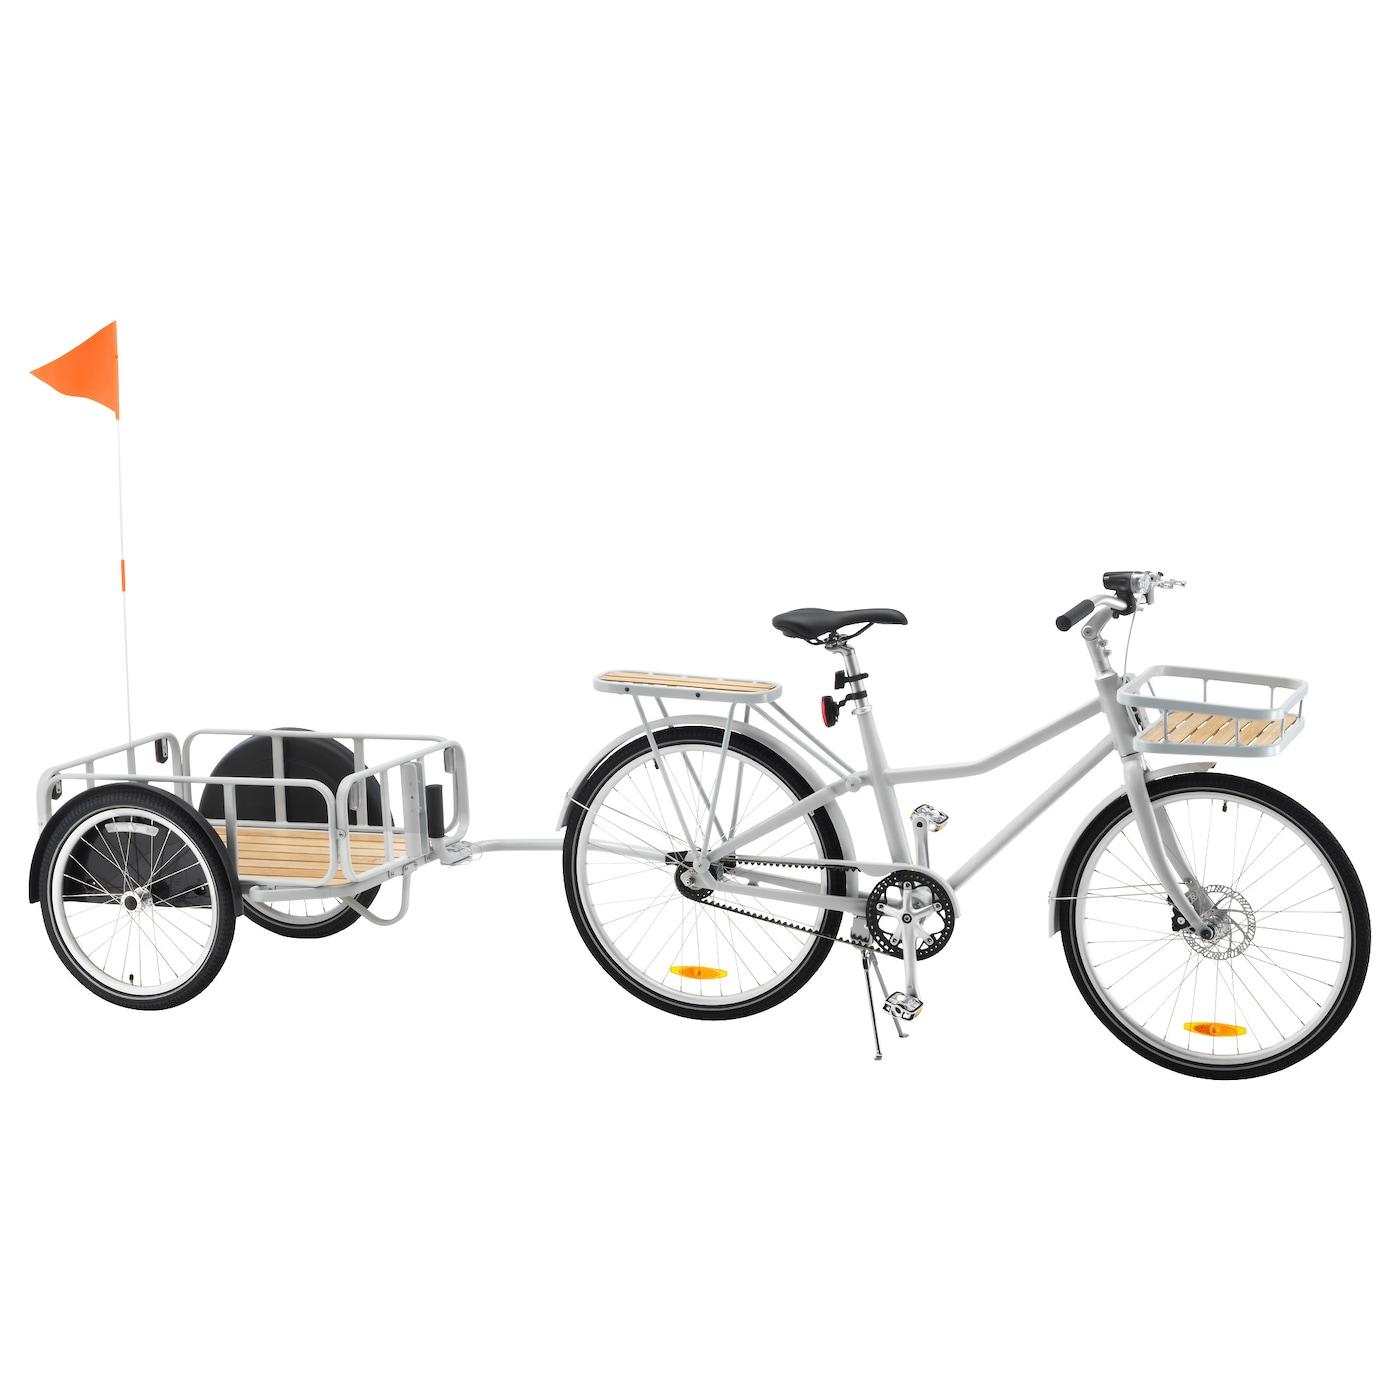 Sladda bicycle grey 28 ikea for Ikea sladda bike